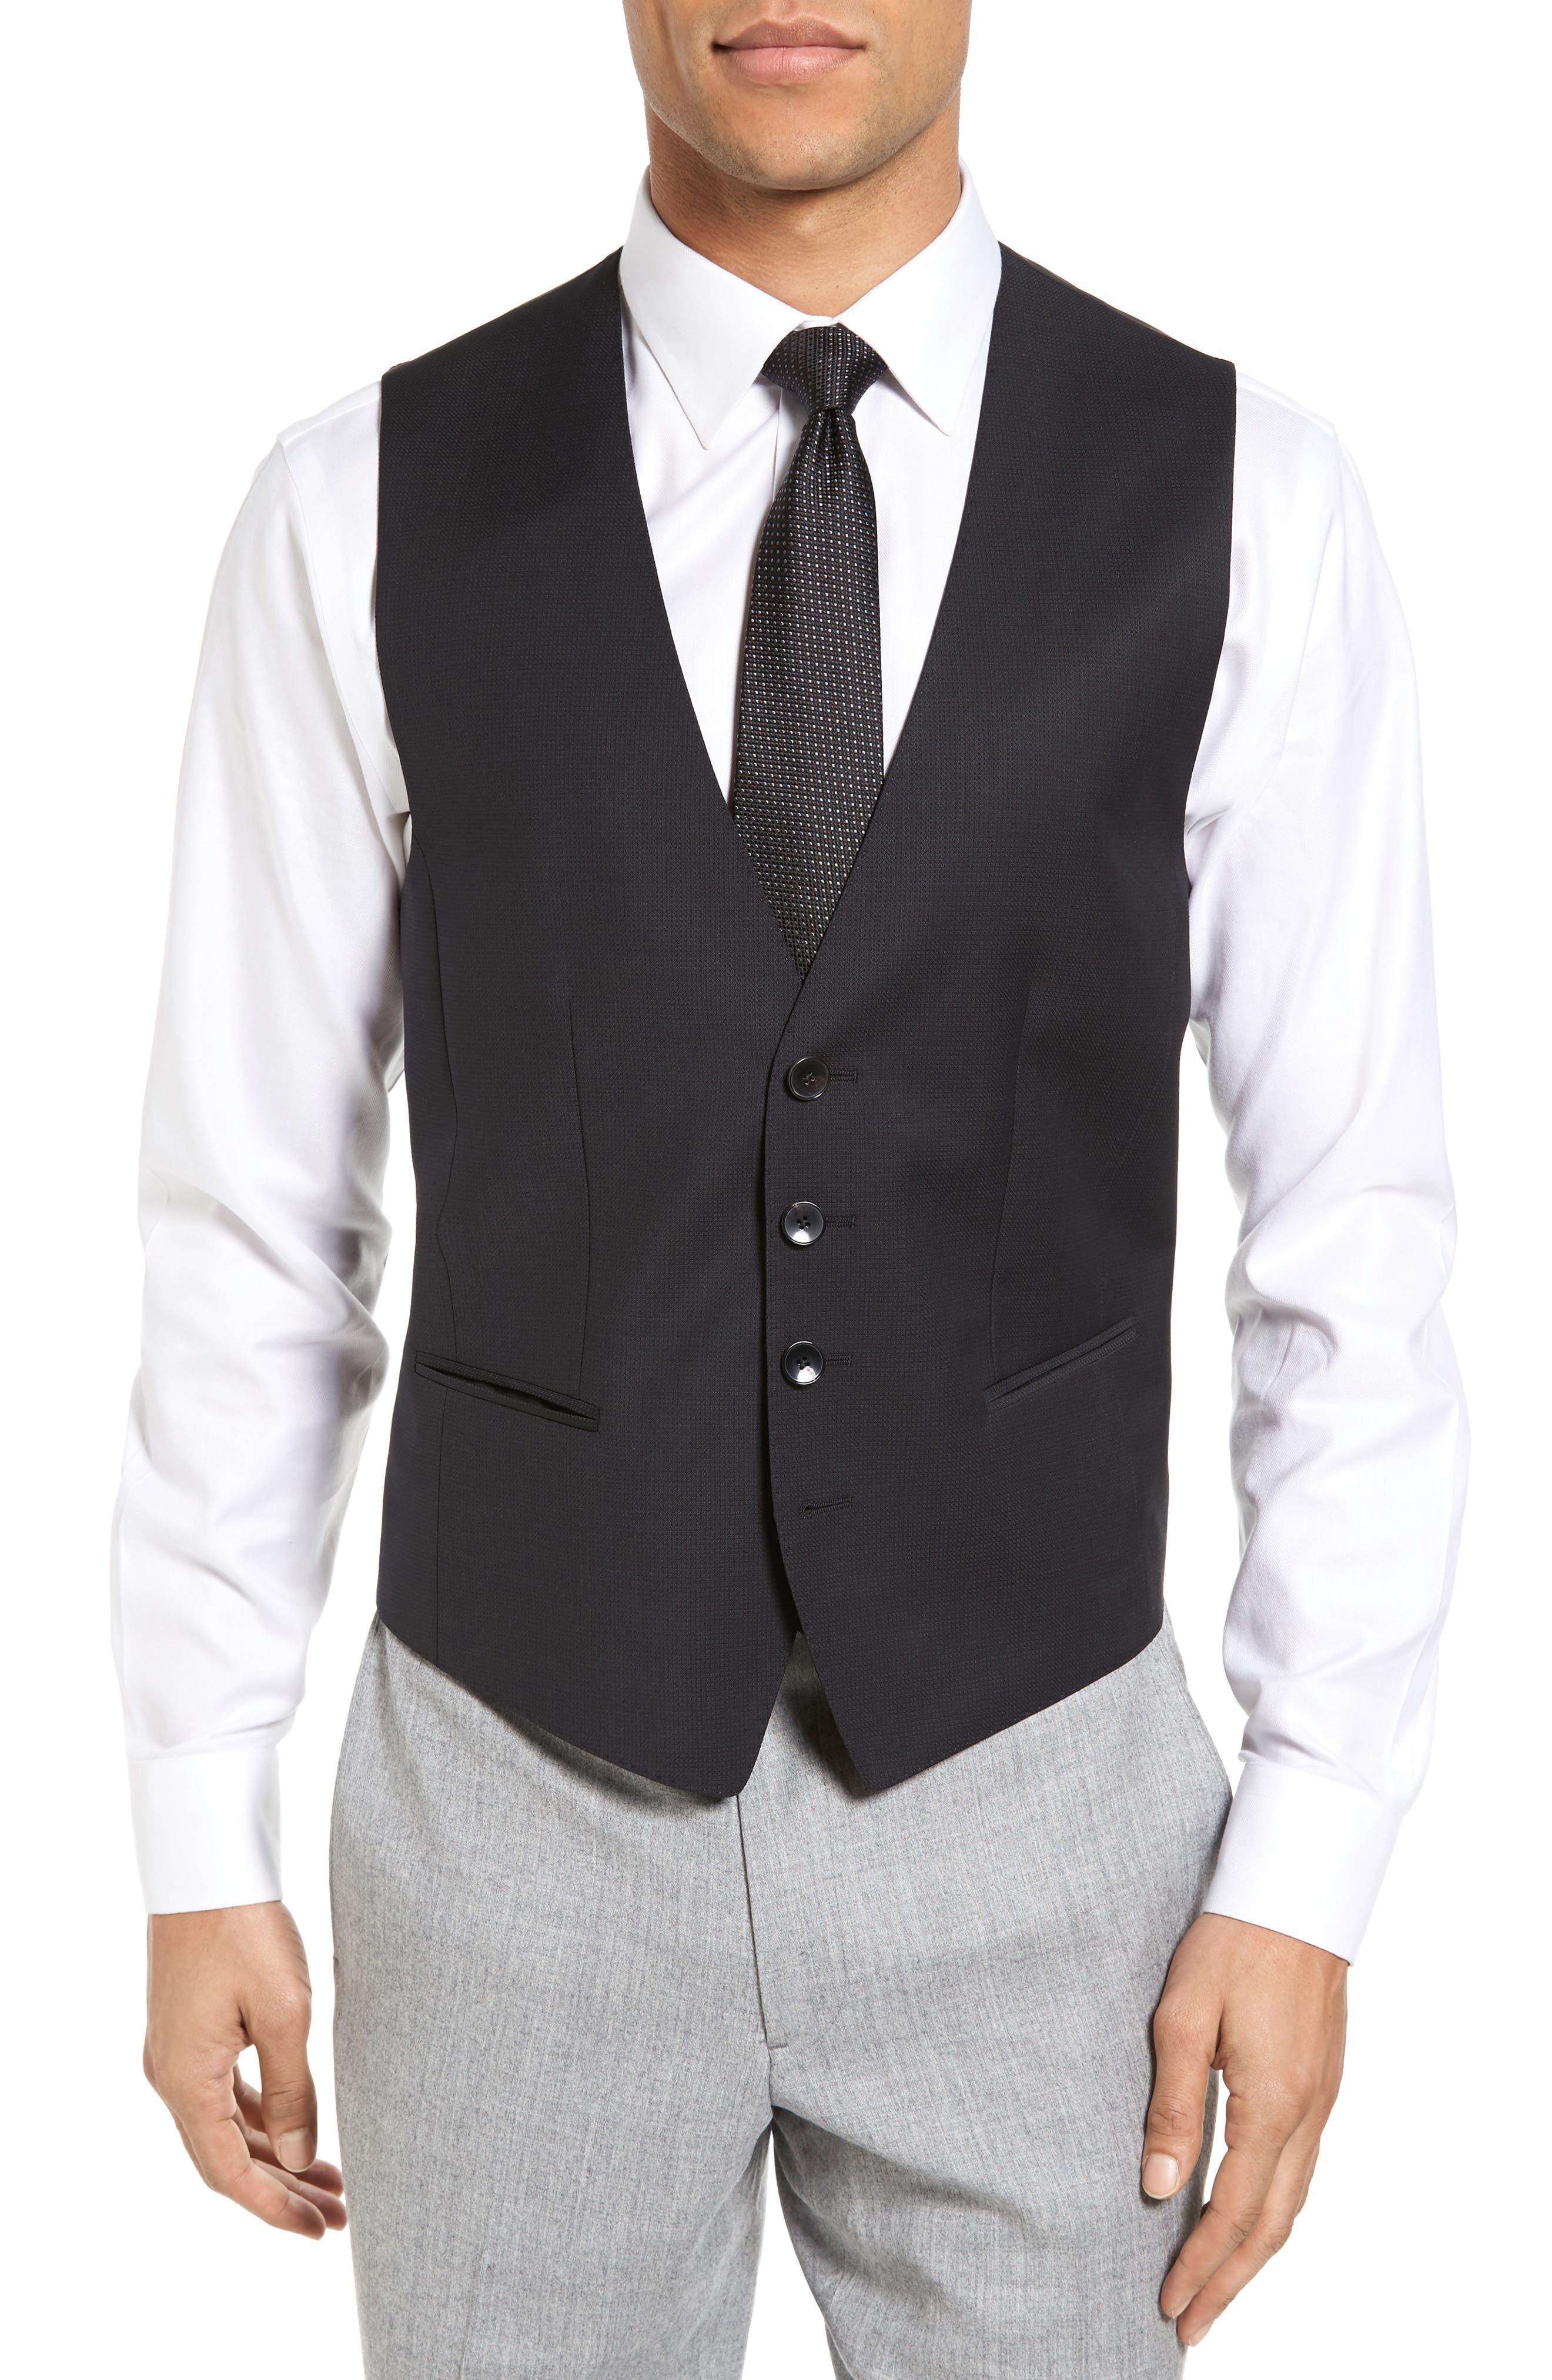 Main Image - BOSS Huge Weste Trim Fit Wool Vest